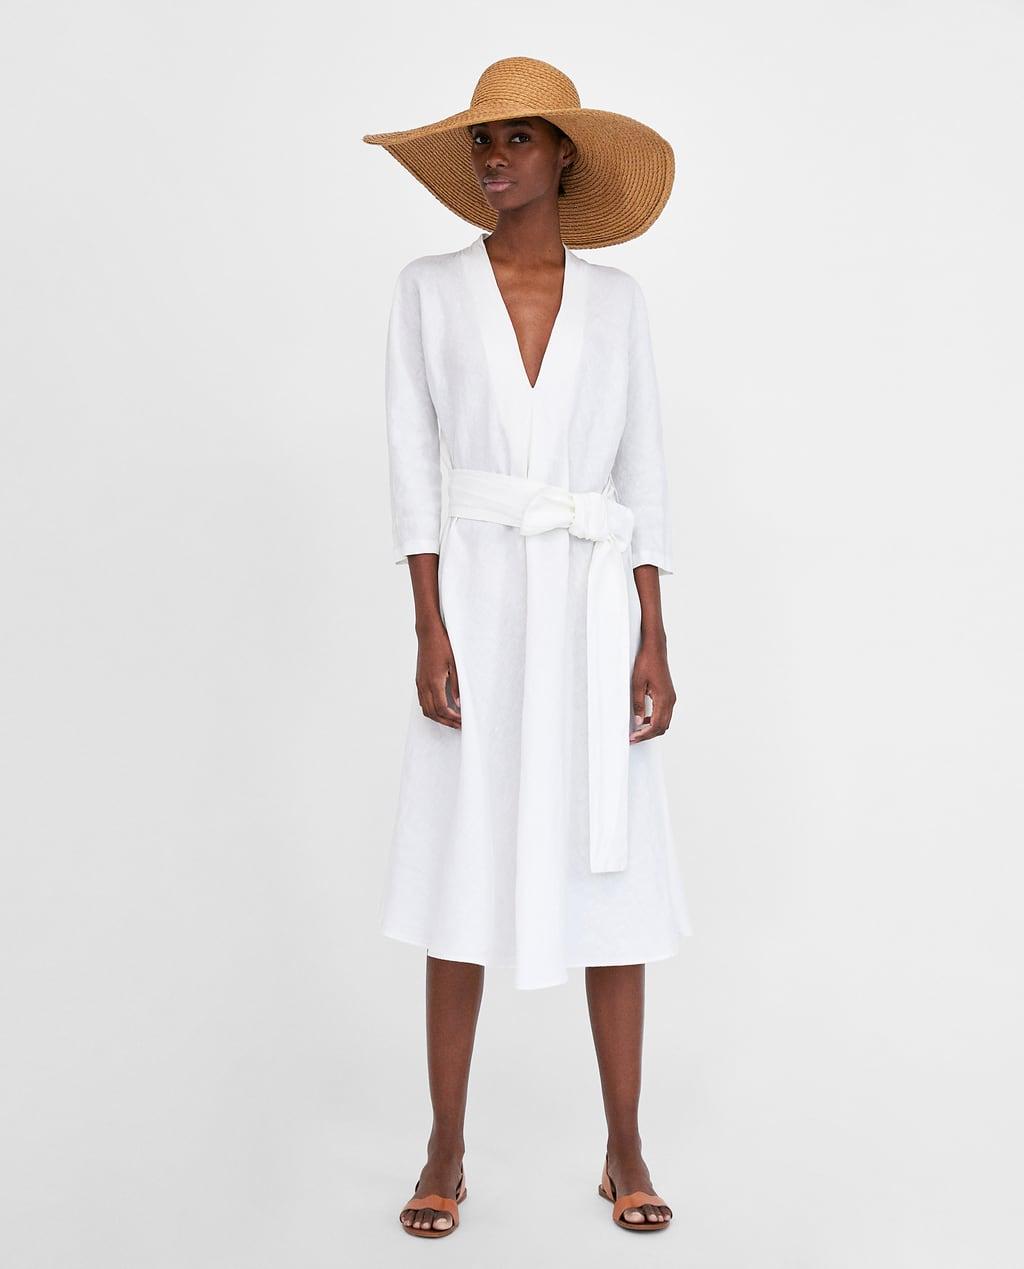 Zara dress €39,95